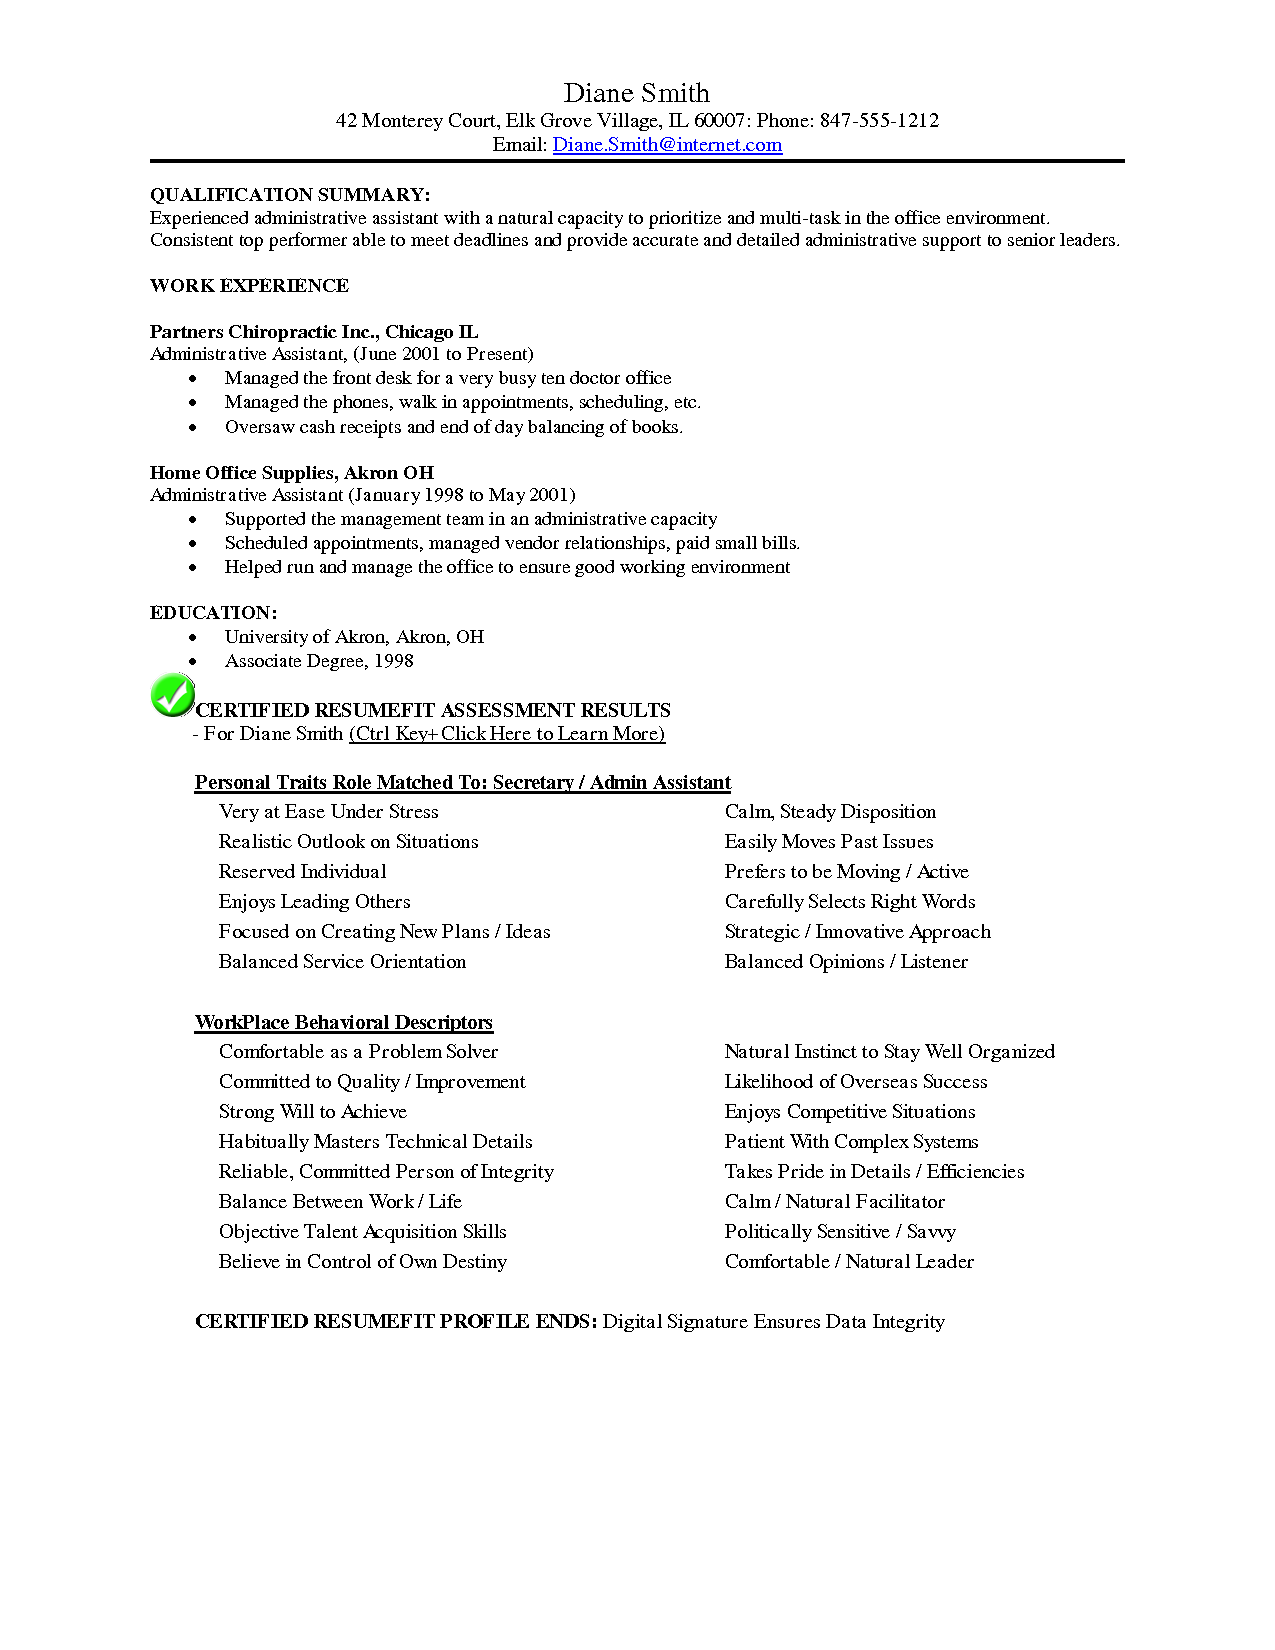 Chiropractic Resume Example